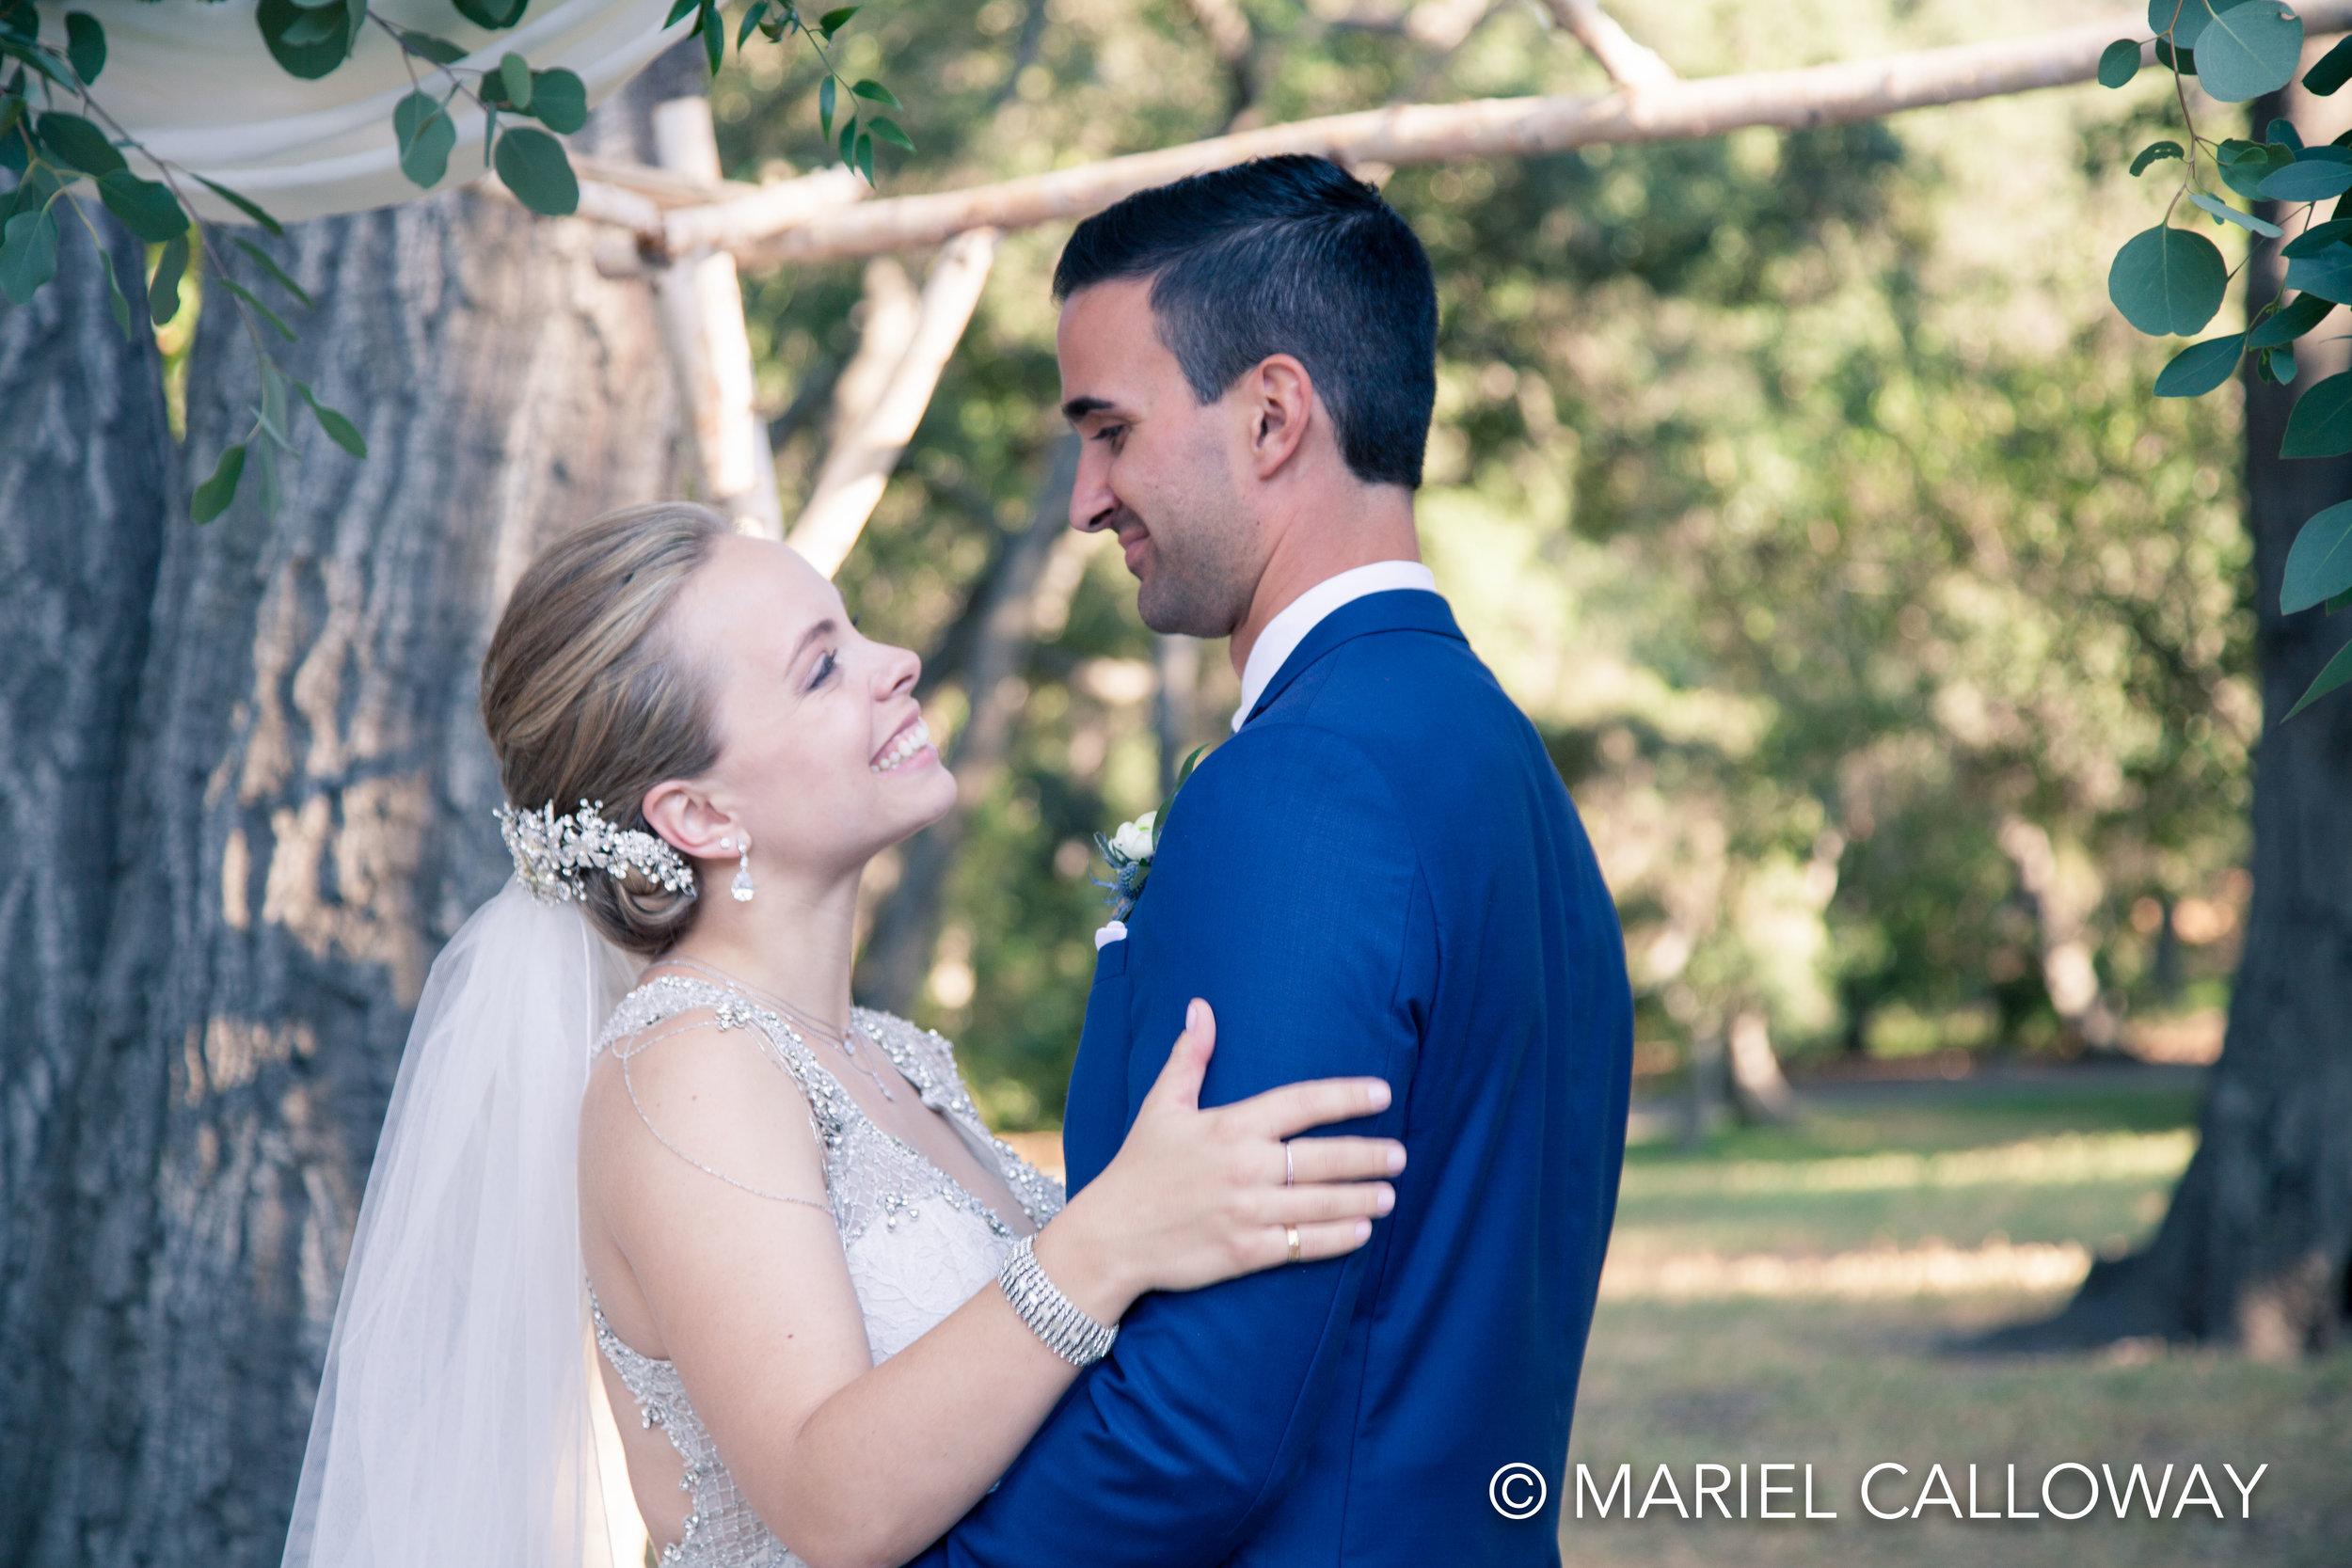 Mariel-Calloway-Los-Angeles-Wedding-Photography-Smith-26.jpg